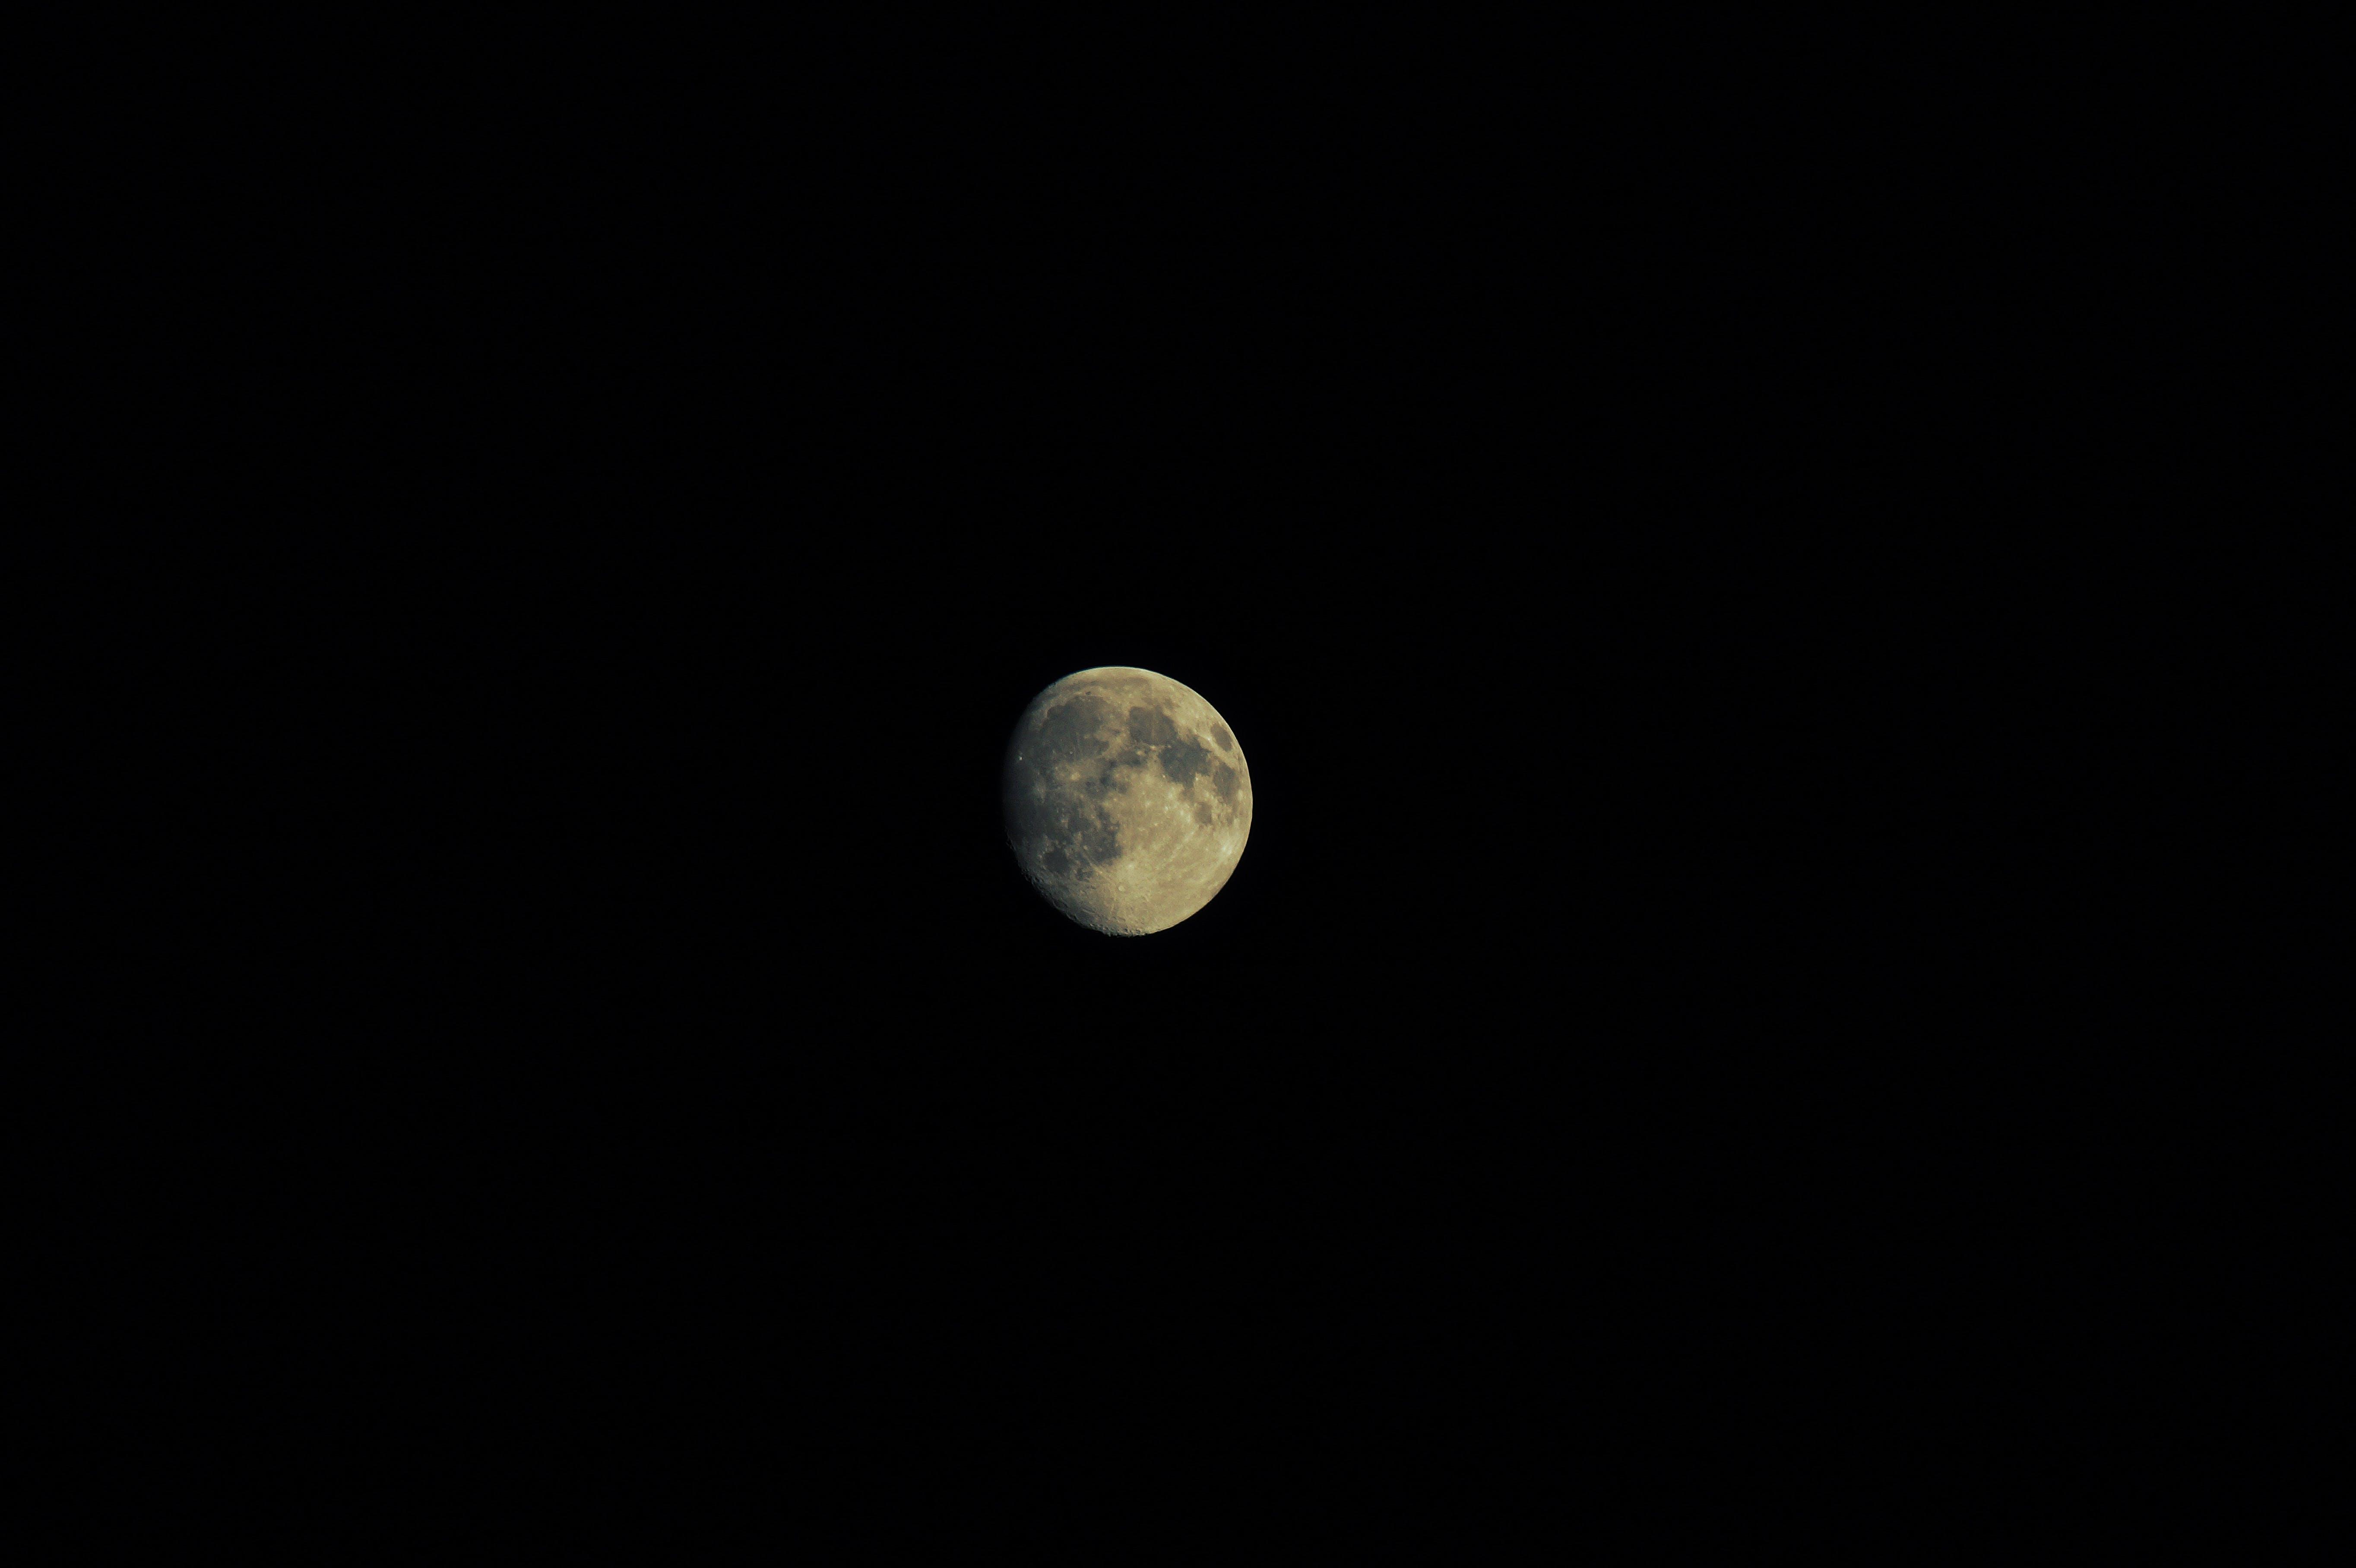 astronomy, dark, full moon